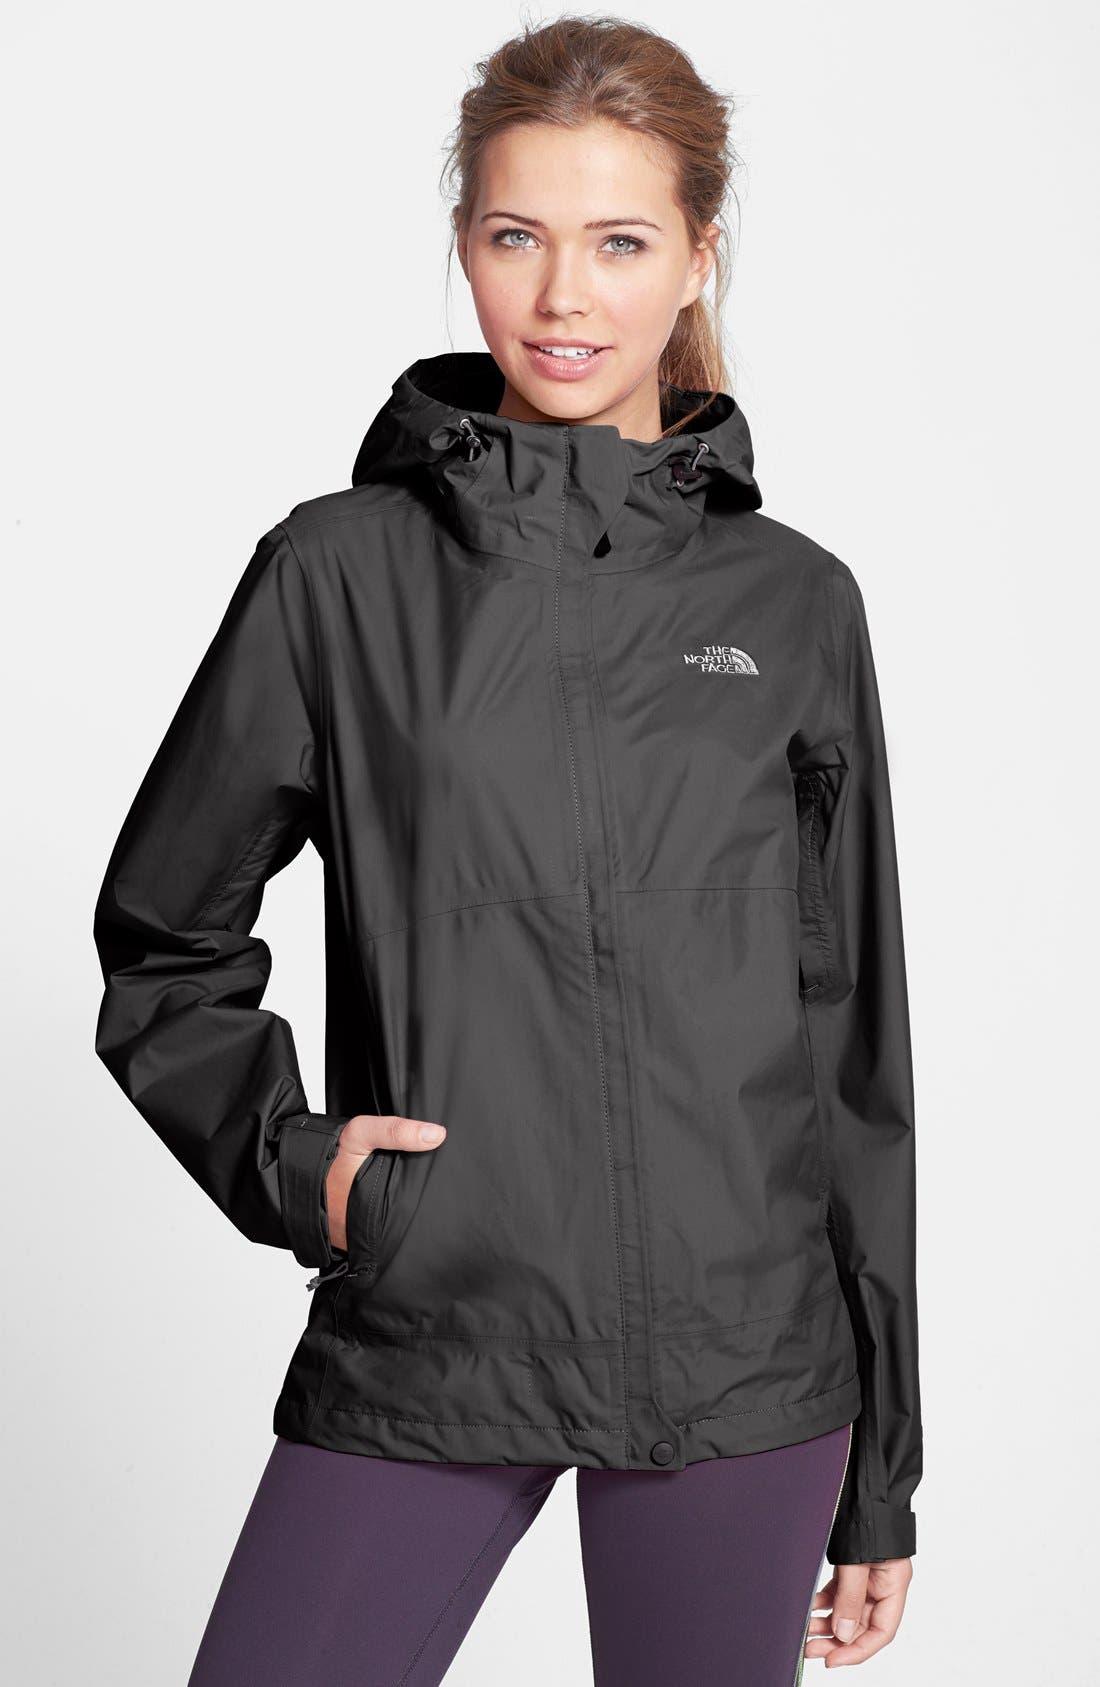 North face dryzzle jacket women's